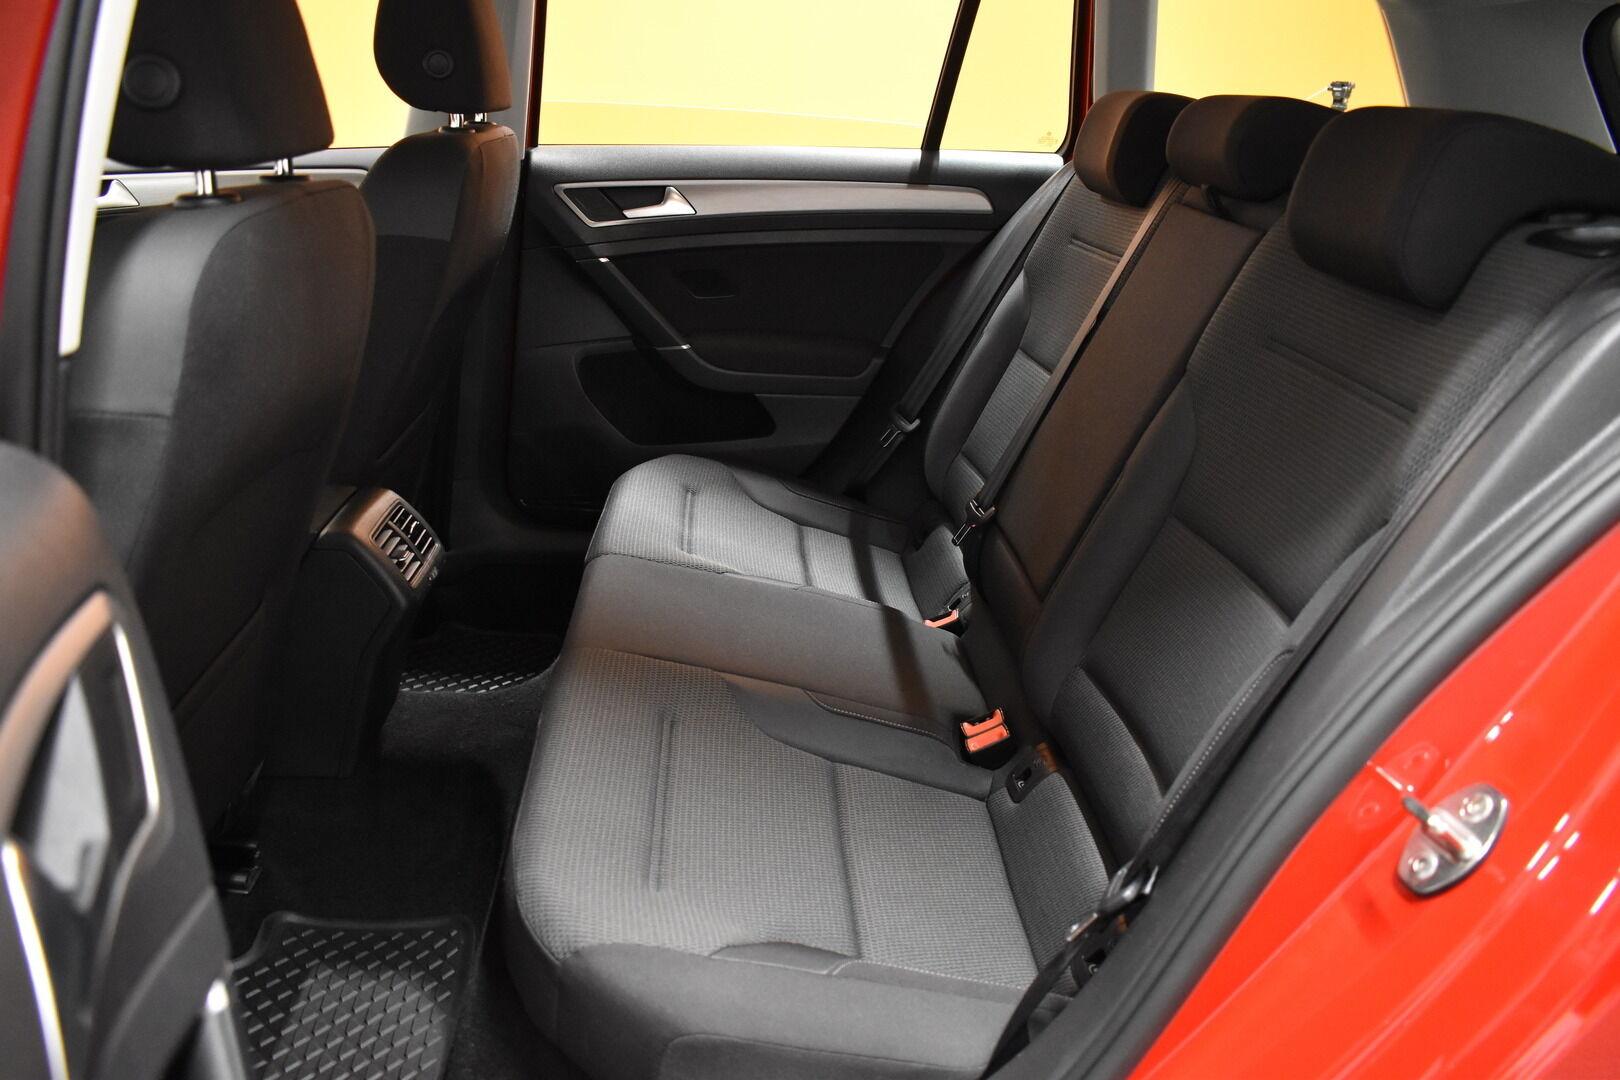 Punainen Farmari, Volkswagen Golf – LEM-79340, kuva 11